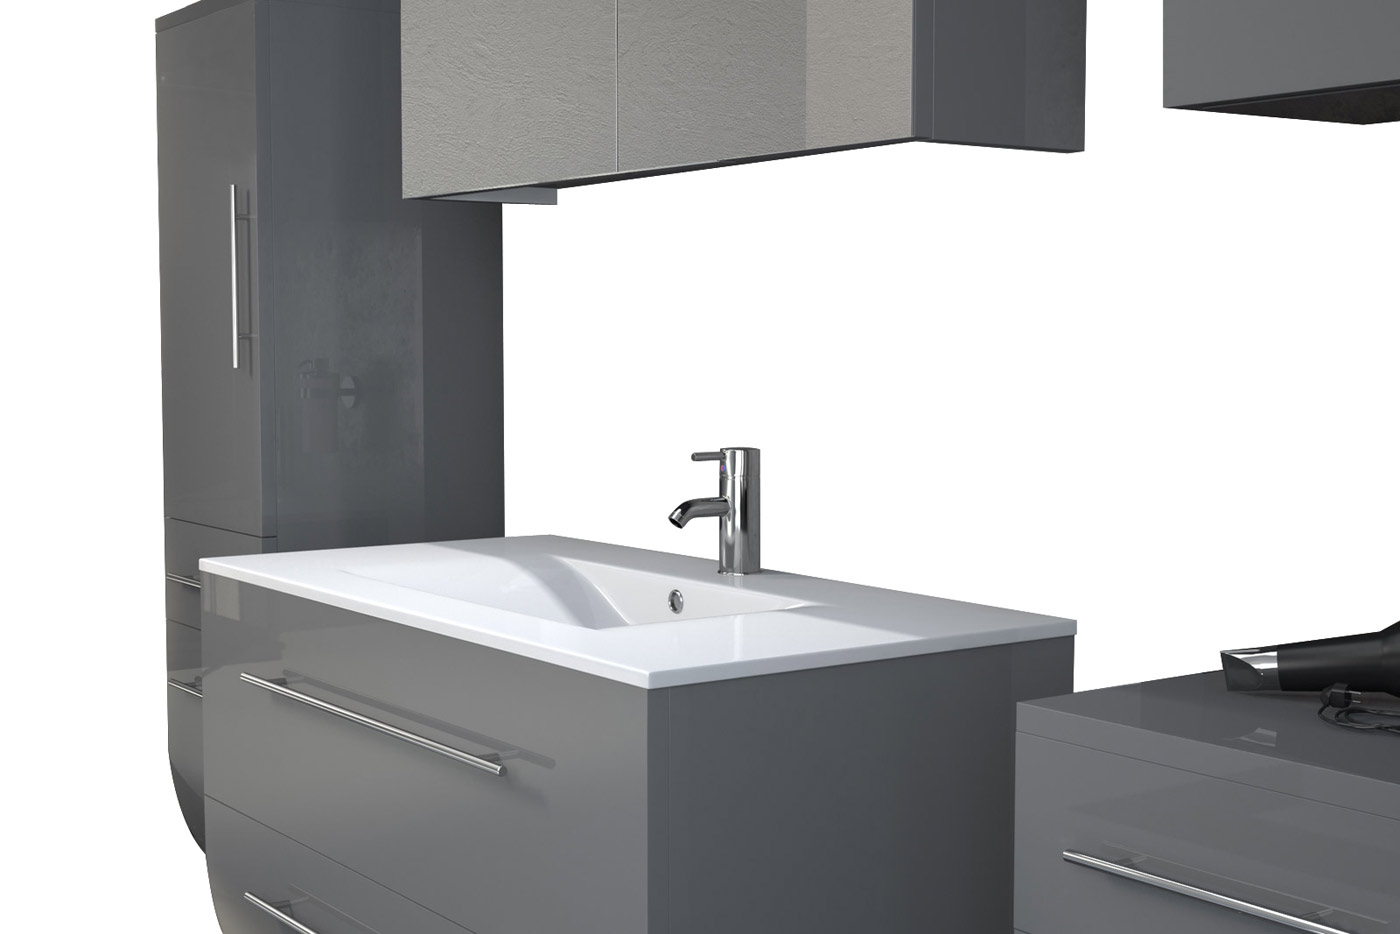 sam badezimmerm bel zagona 5tlg grau hochglanz 90 cm demn chst. Black Bedroom Furniture Sets. Home Design Ideas